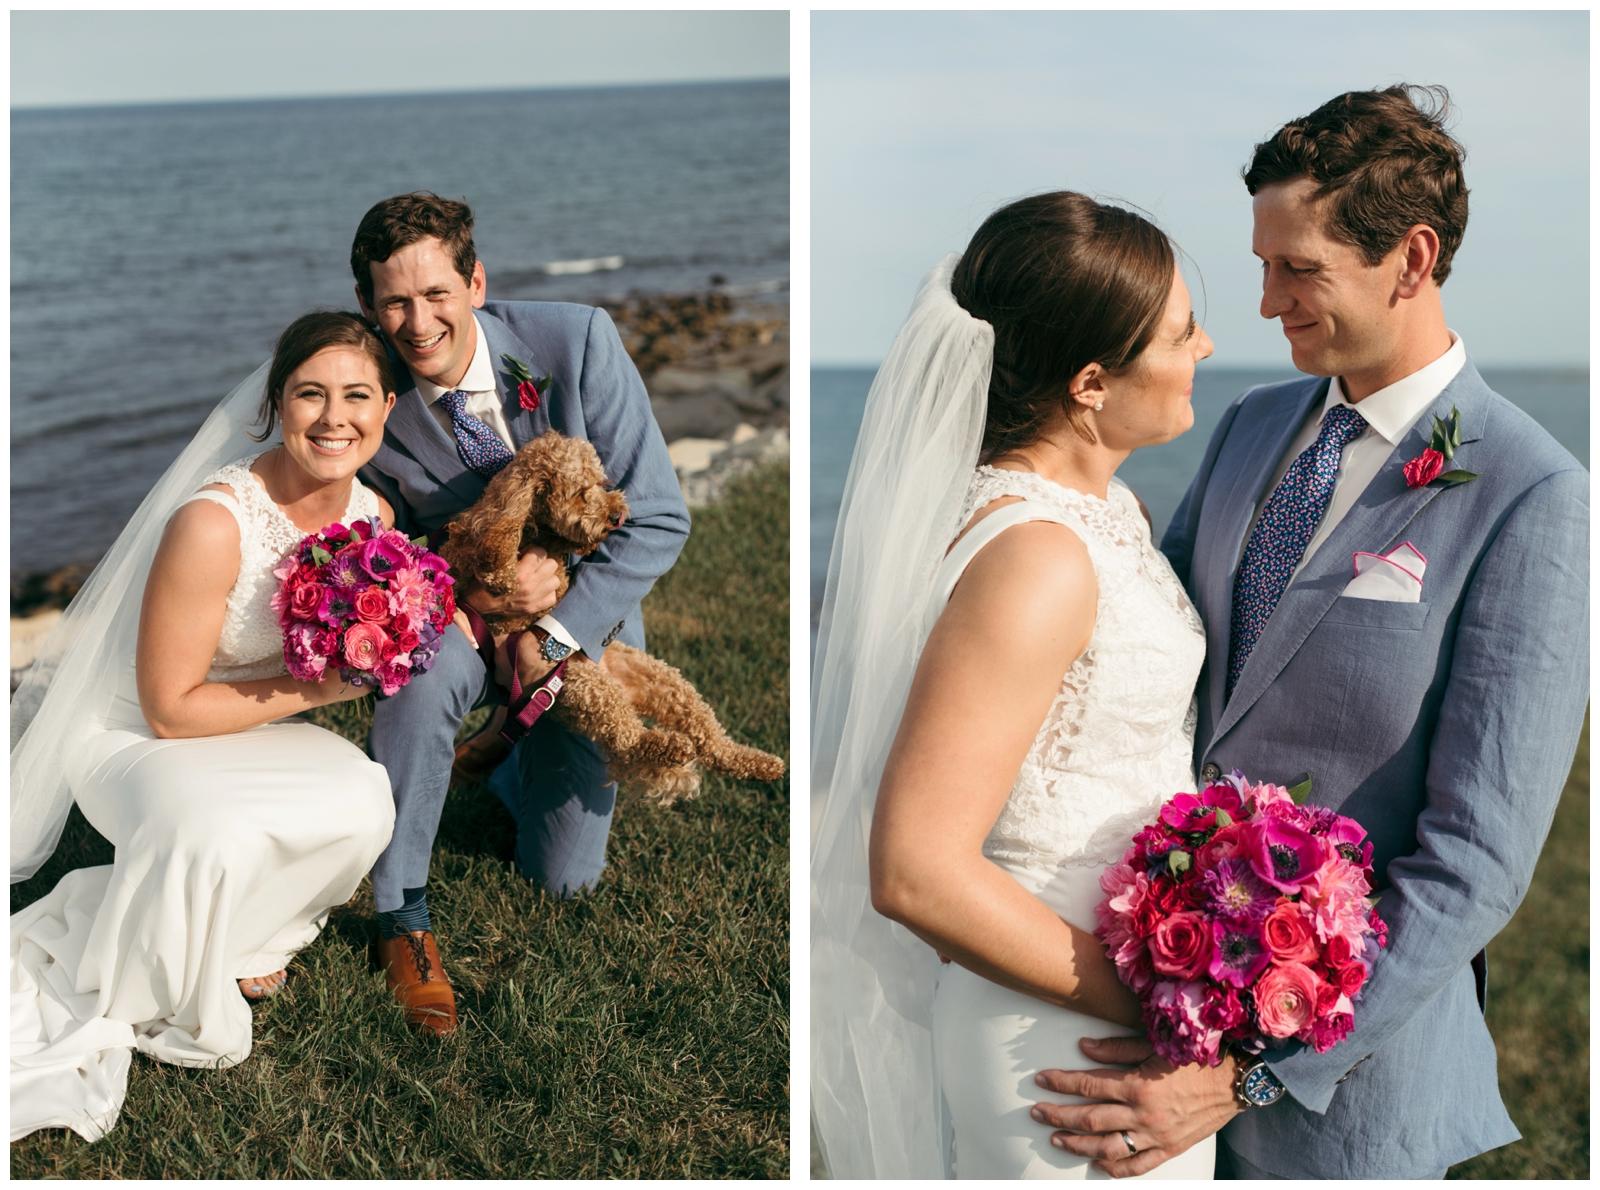 Bailey-Q-Photo-Backyard-Wedding-South-Shore-Boston-Wedding-Photographer-064.jpg